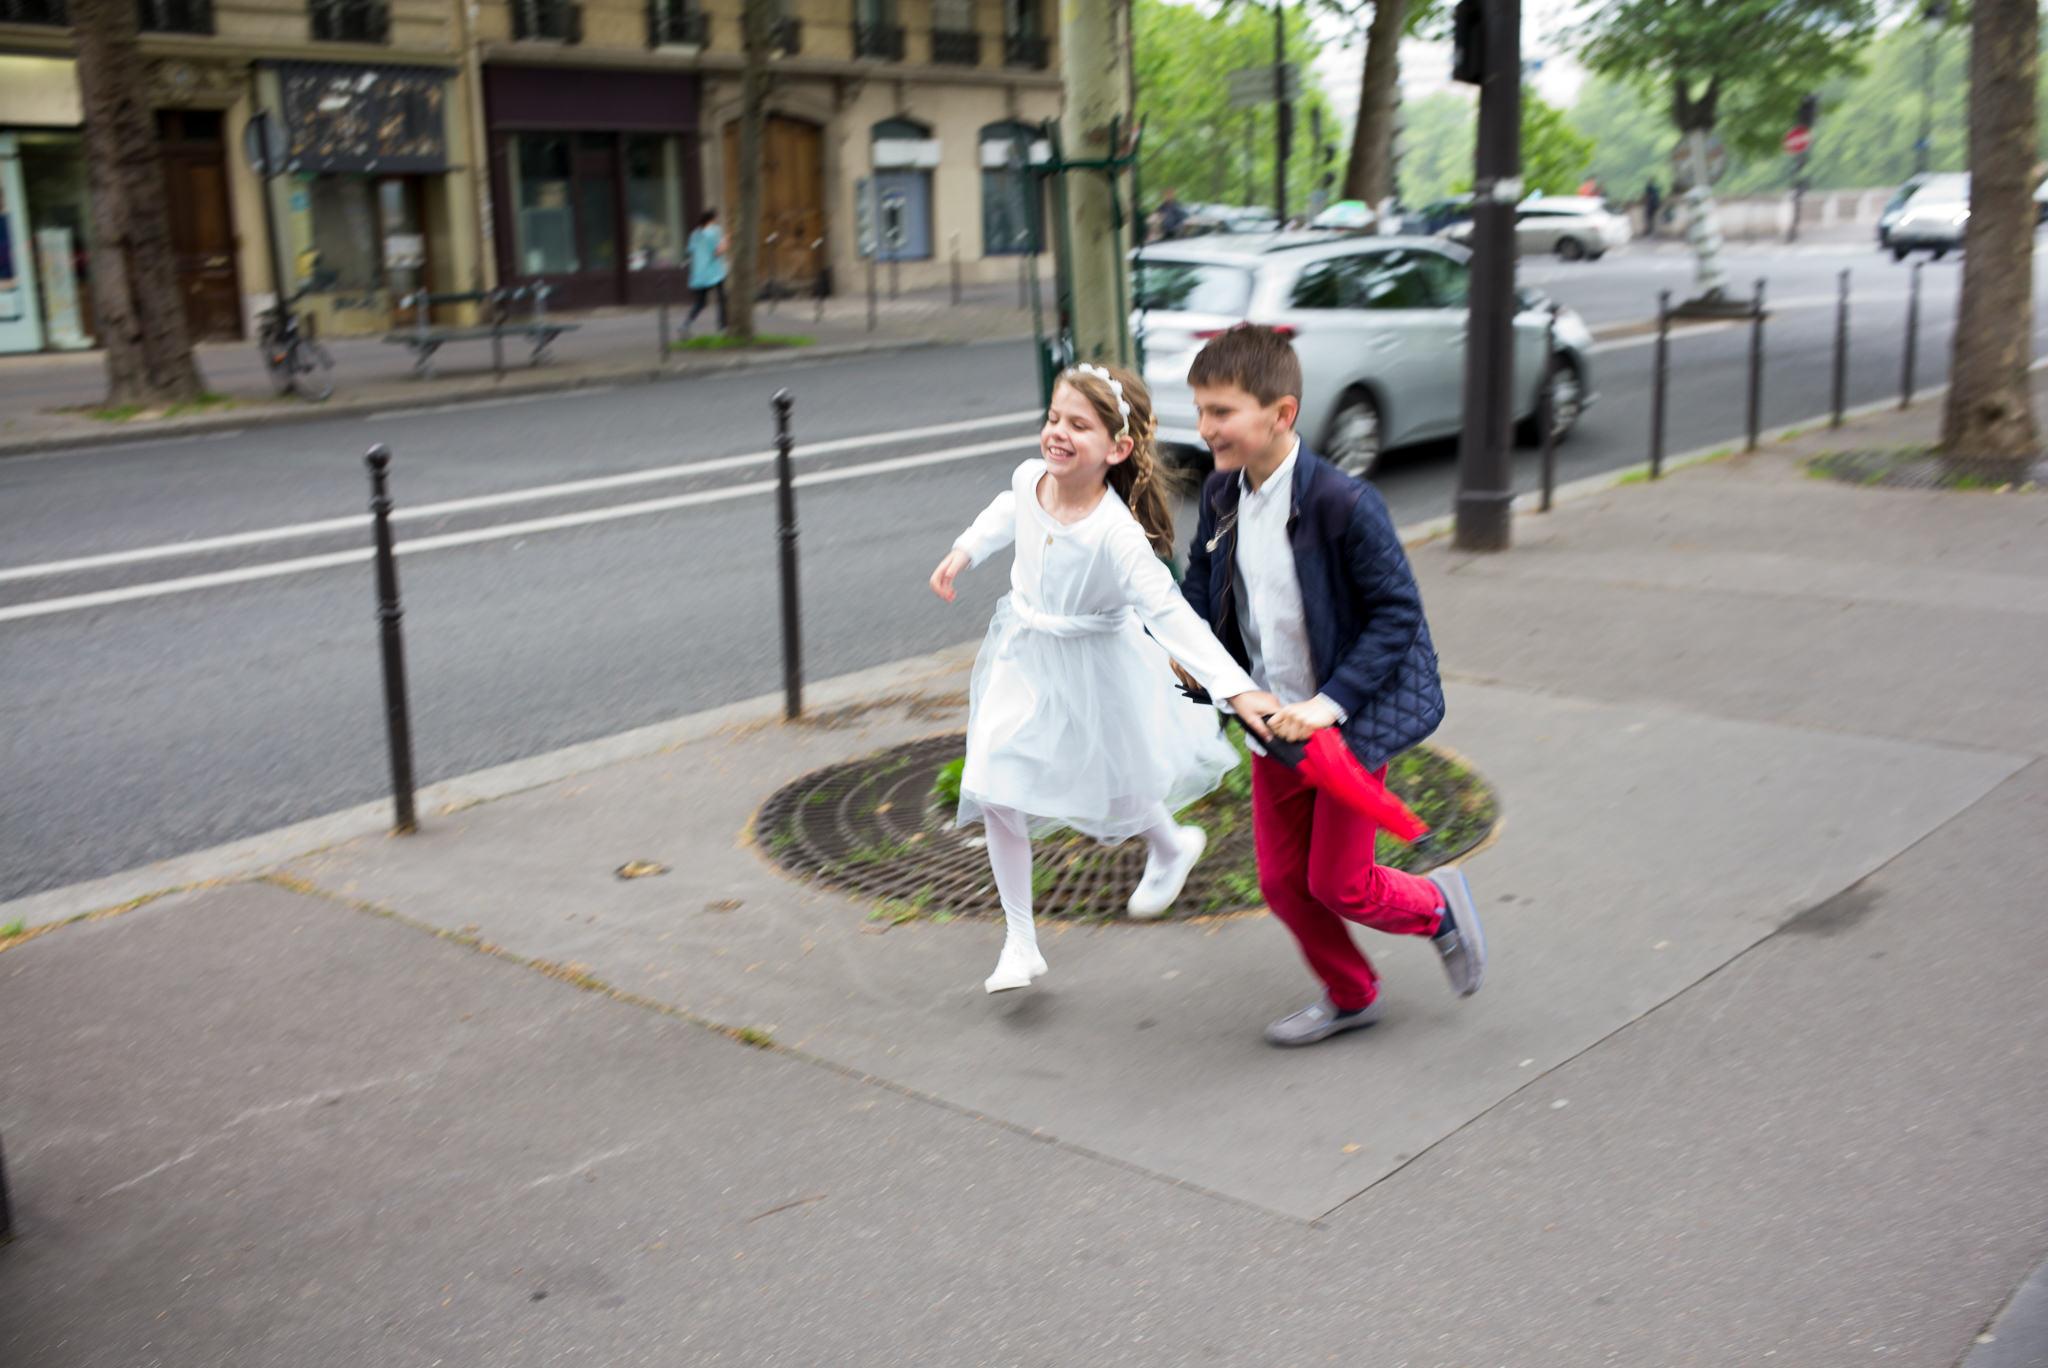 20160529 Paris-1005620.jpg